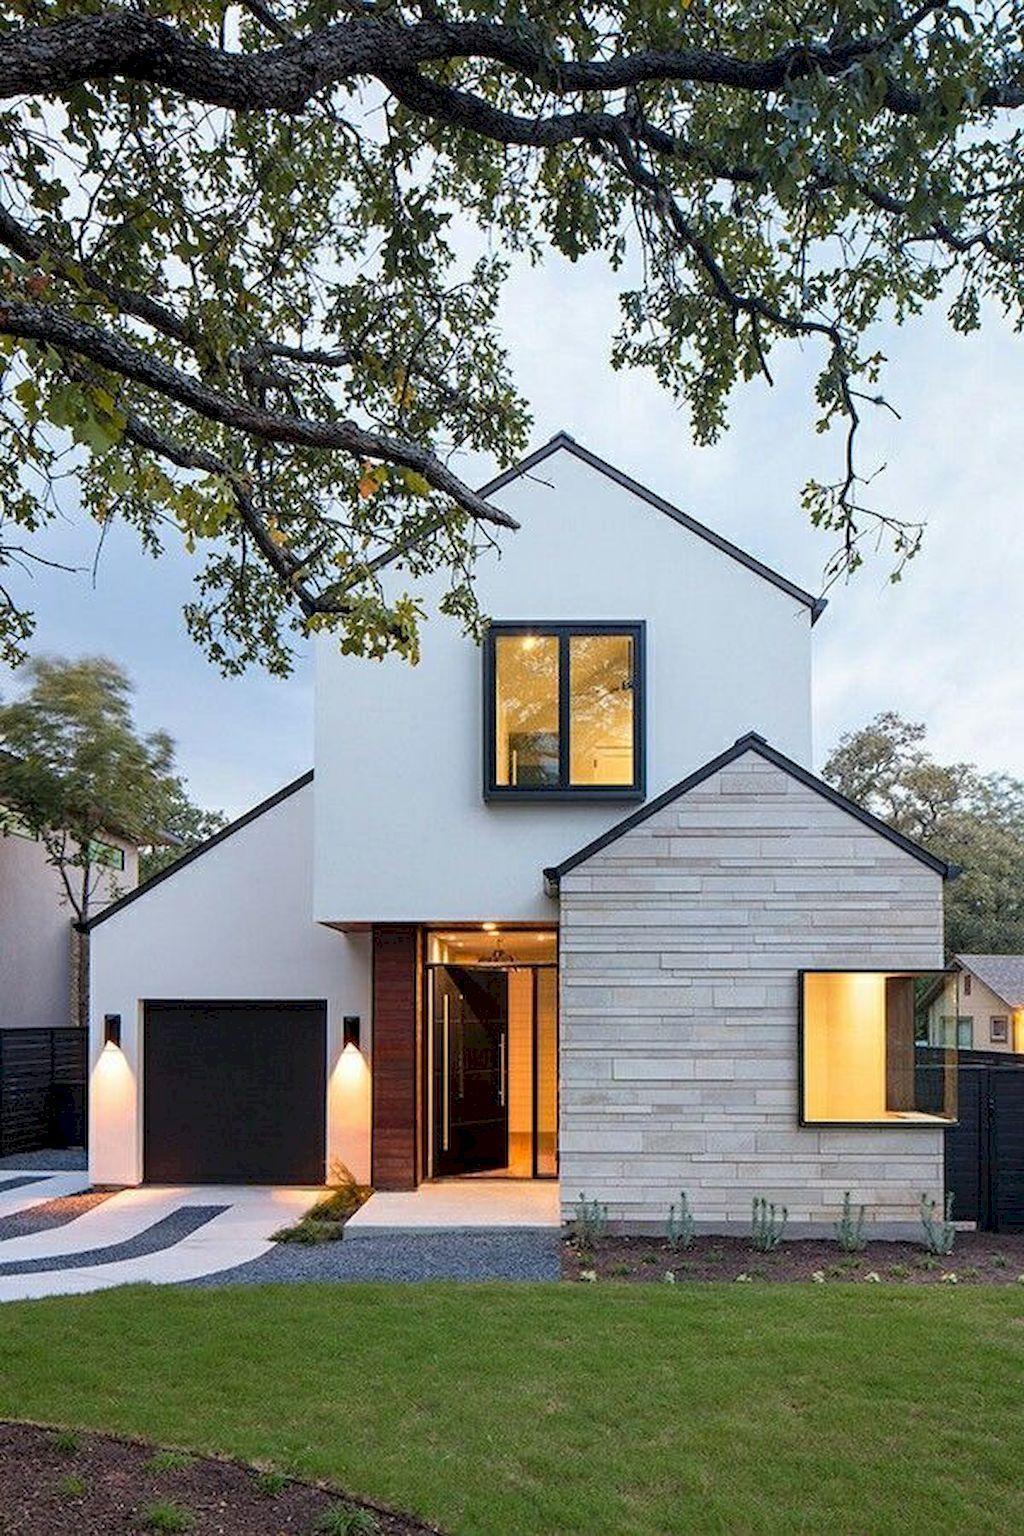 Top scandinavian exterior photo storage 3 american craftsman black house exterior small